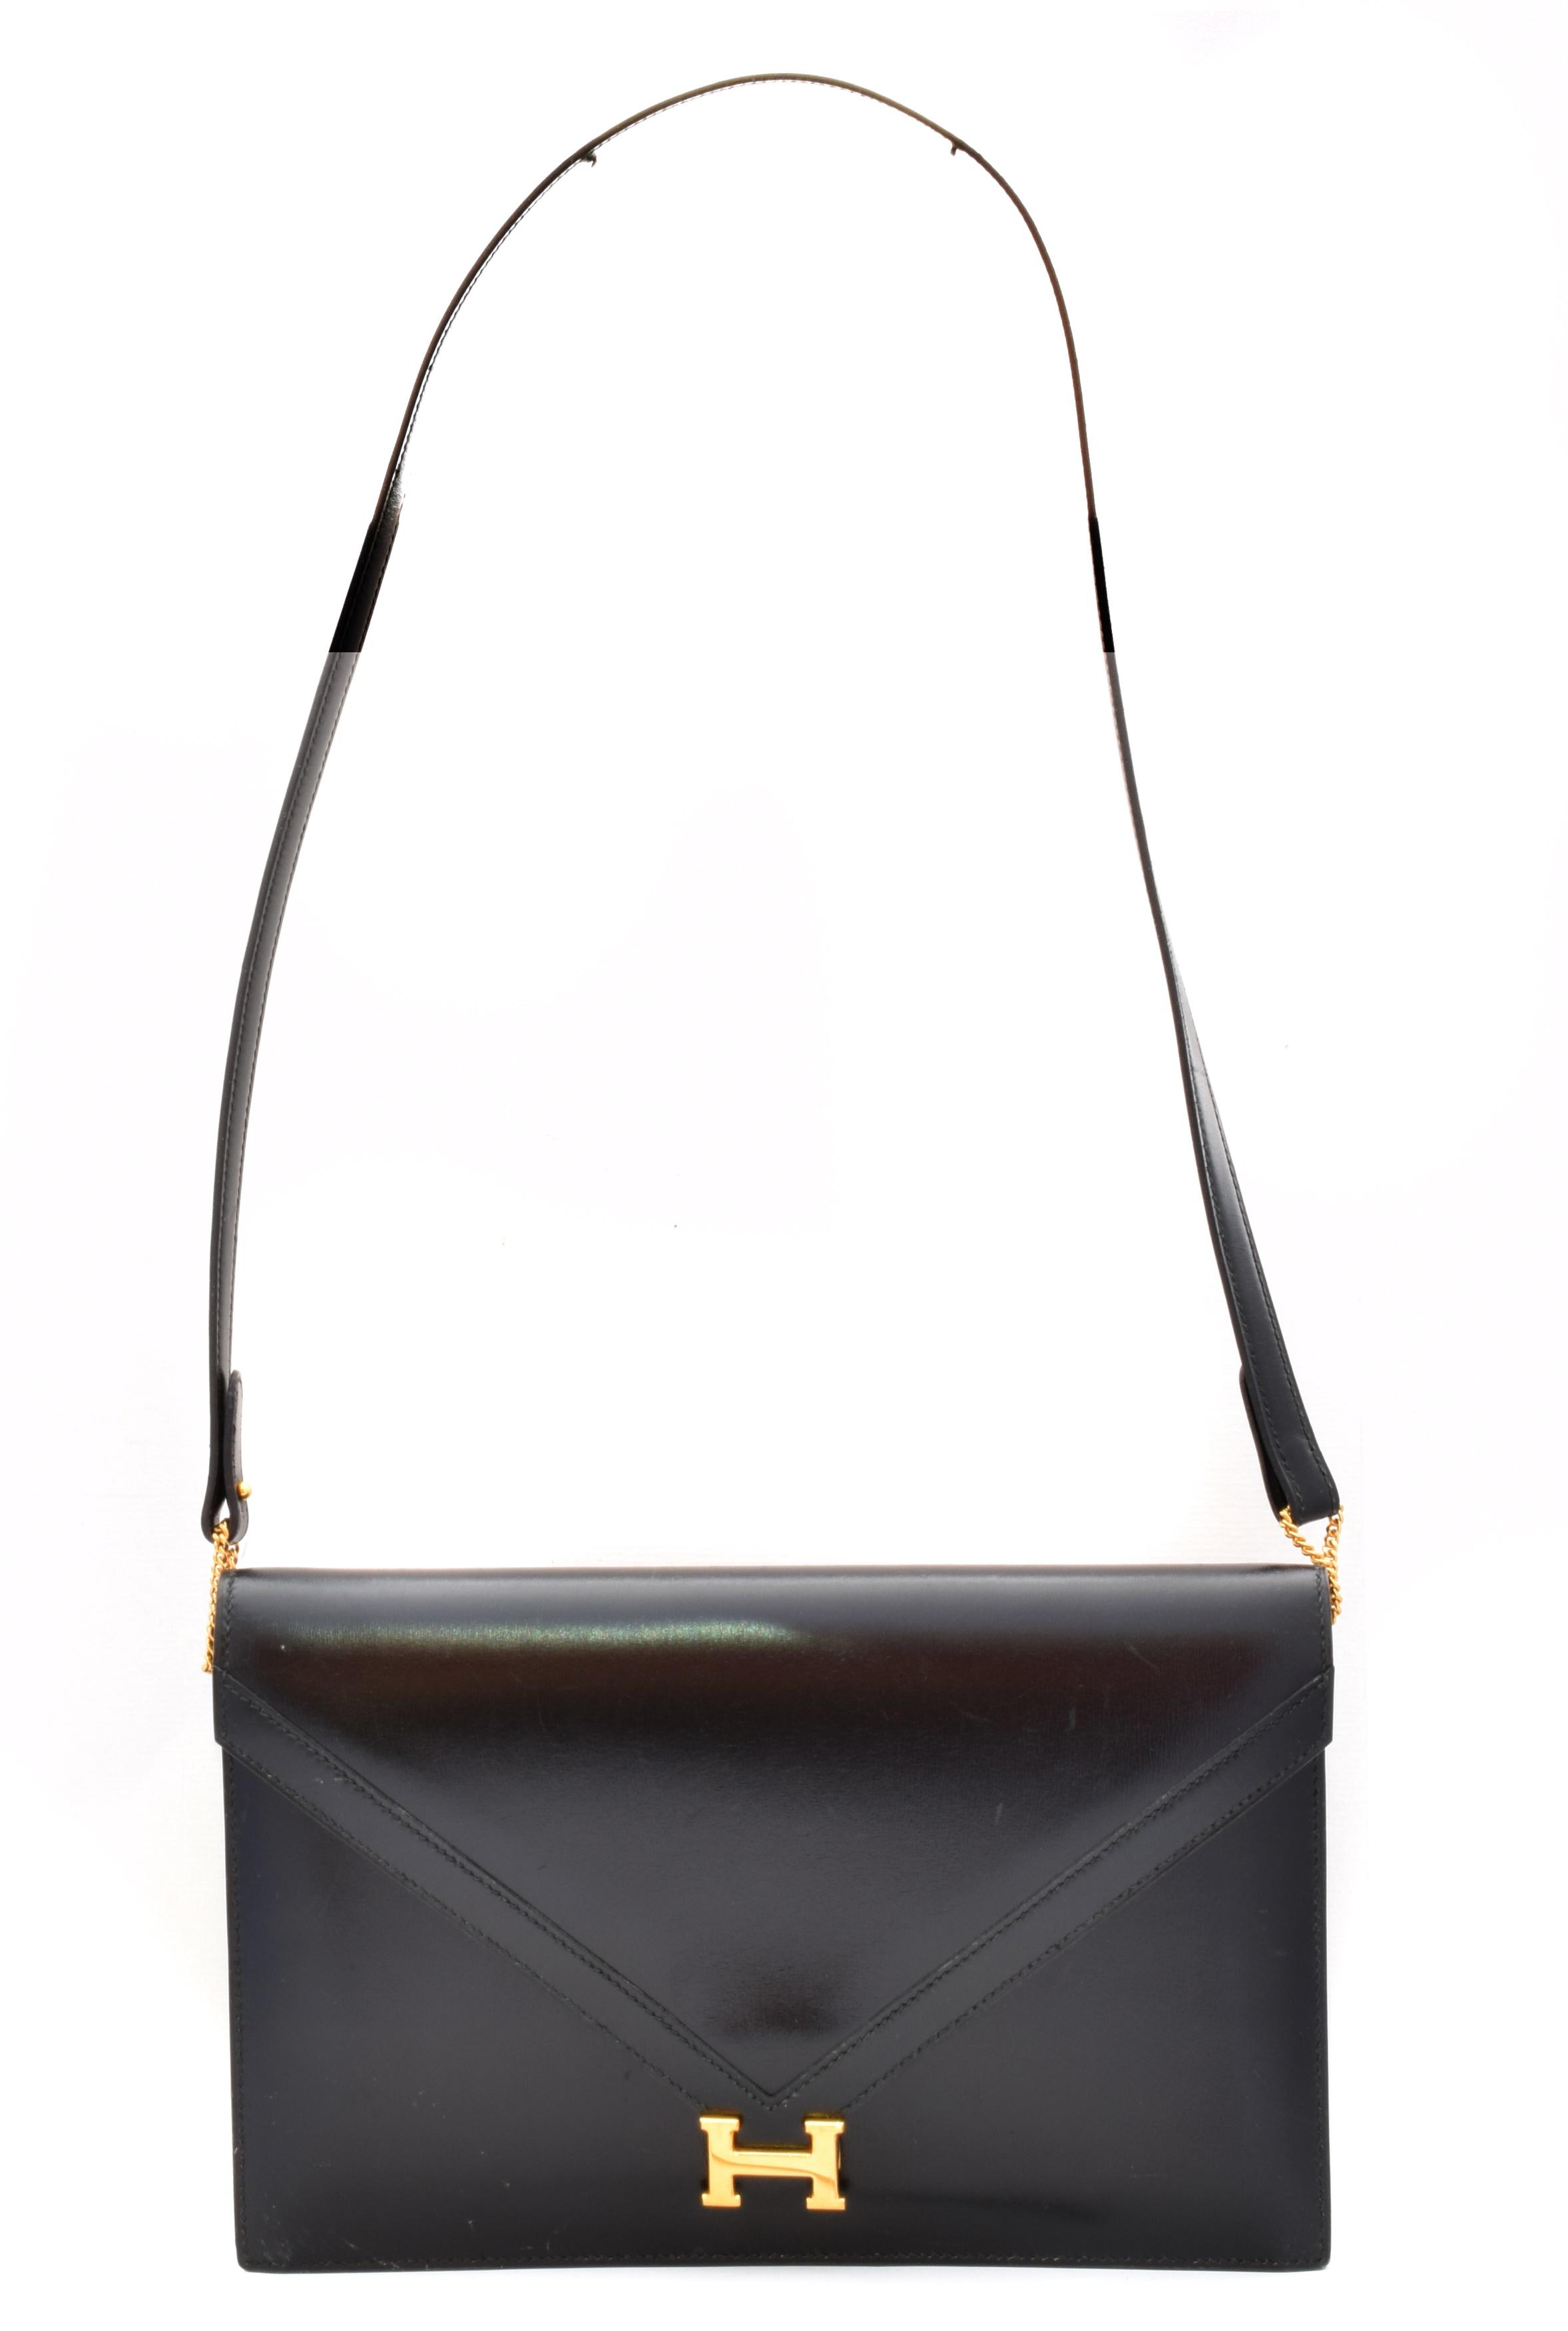 A Hermes Lydie Shoulder Bag,